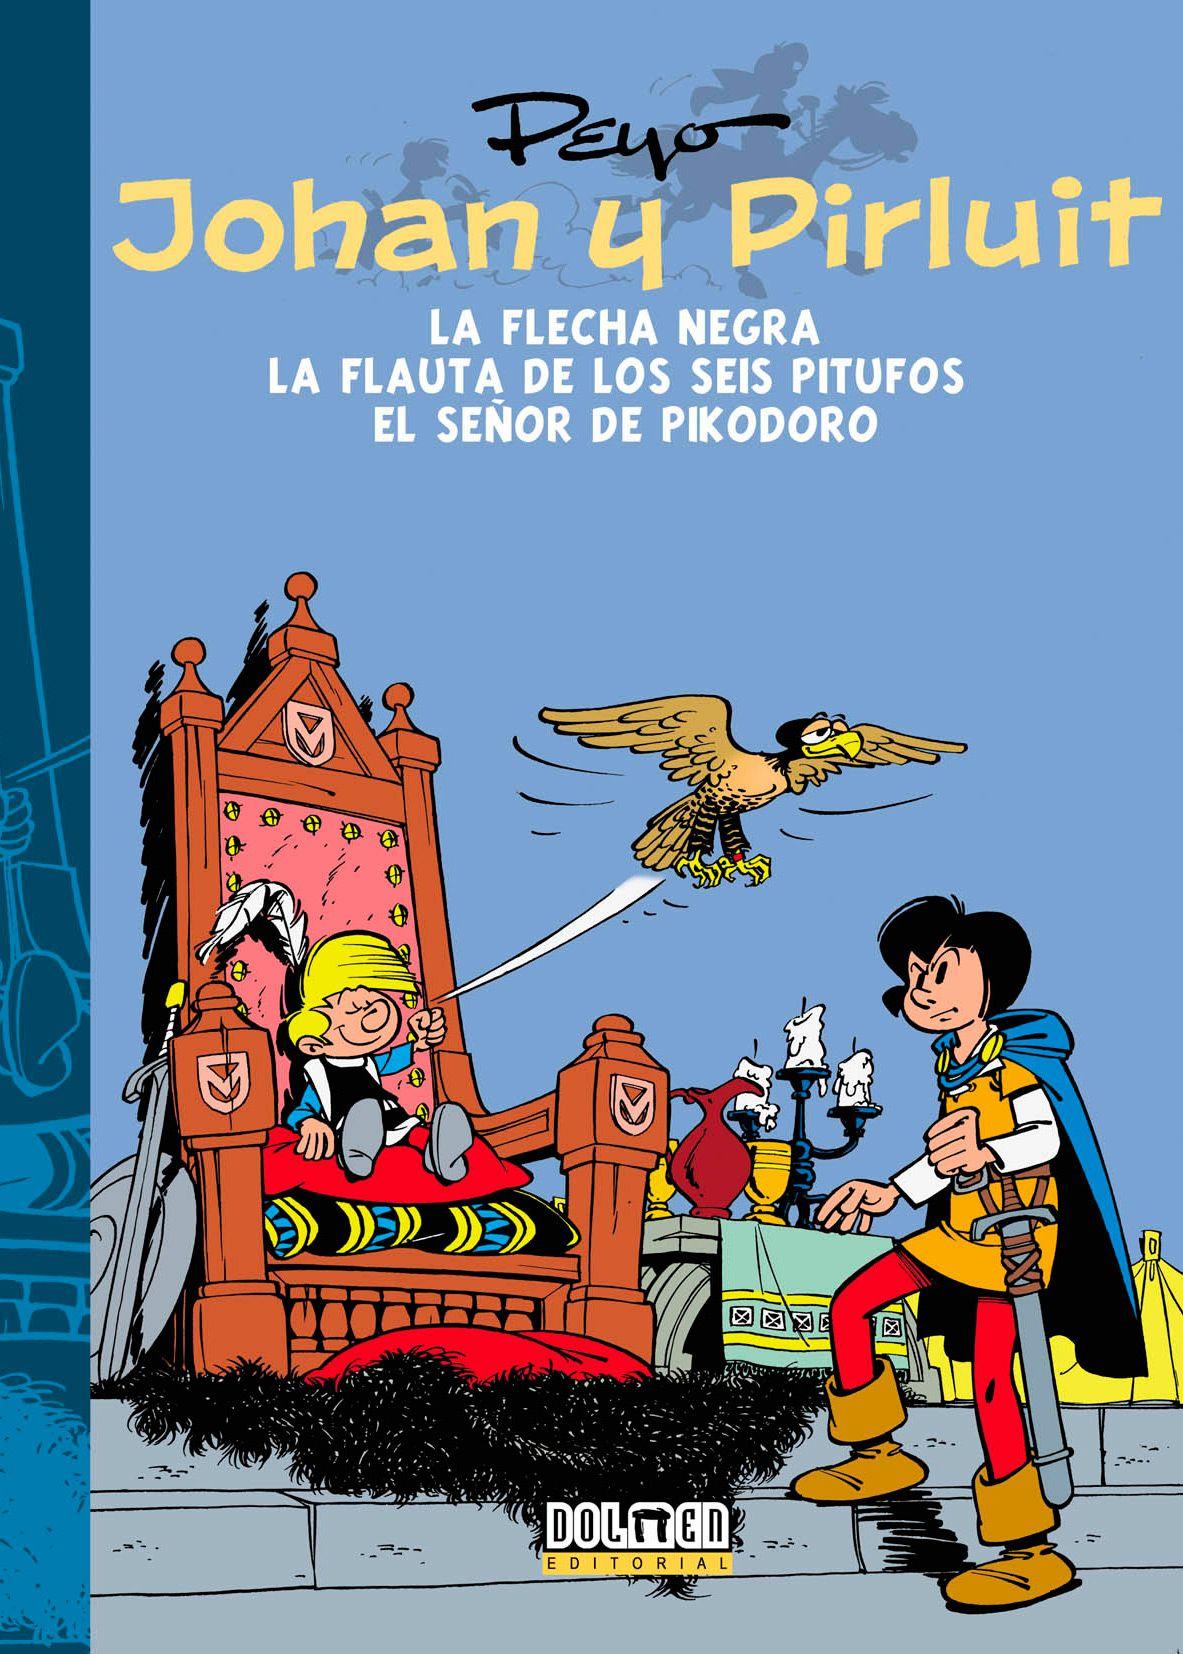 En La Frecha Negra Inedito En Espana En Forma De Album Os Protagonistas Deberan Enfrontarse Cun Traidor Oculto No Propio Caste Pitufos Libros Novedades Comic